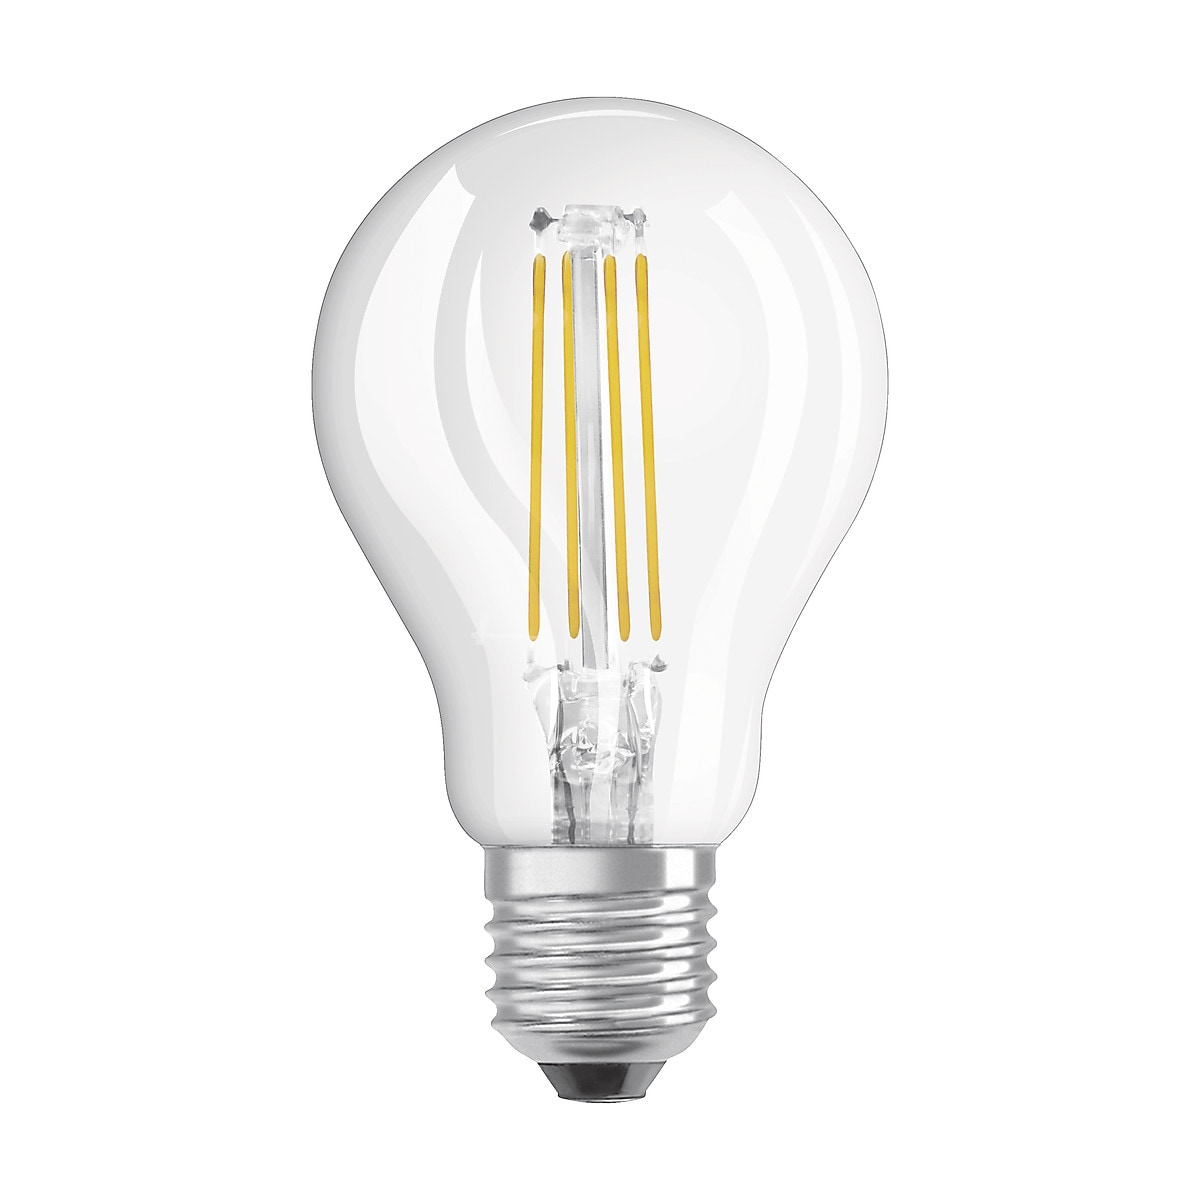 Klotlampa LED Star Classic kallvit E27 Osram